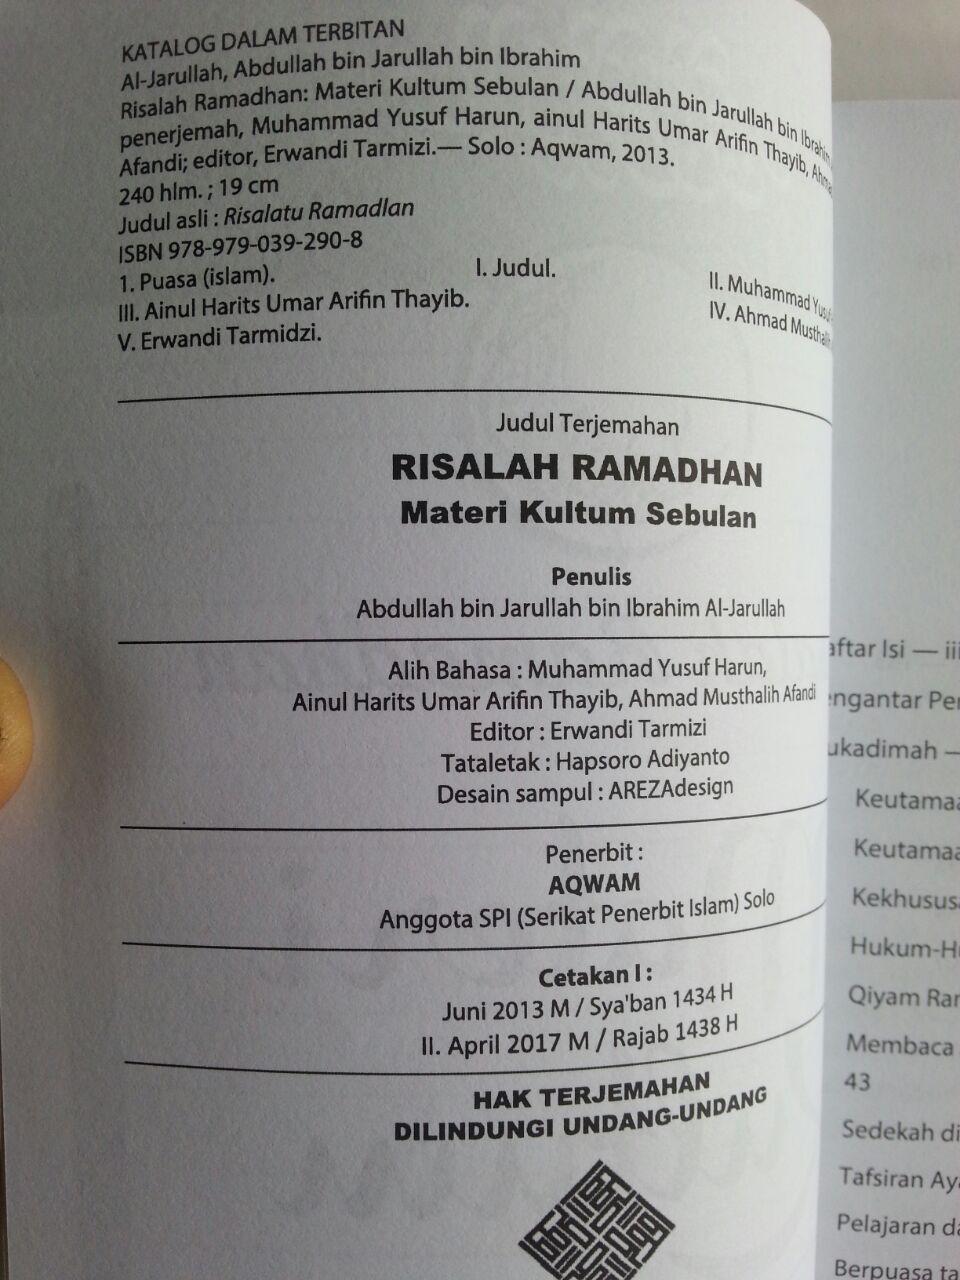 Buku Risalah Ramadhan Materi Kultum Sebulan isi